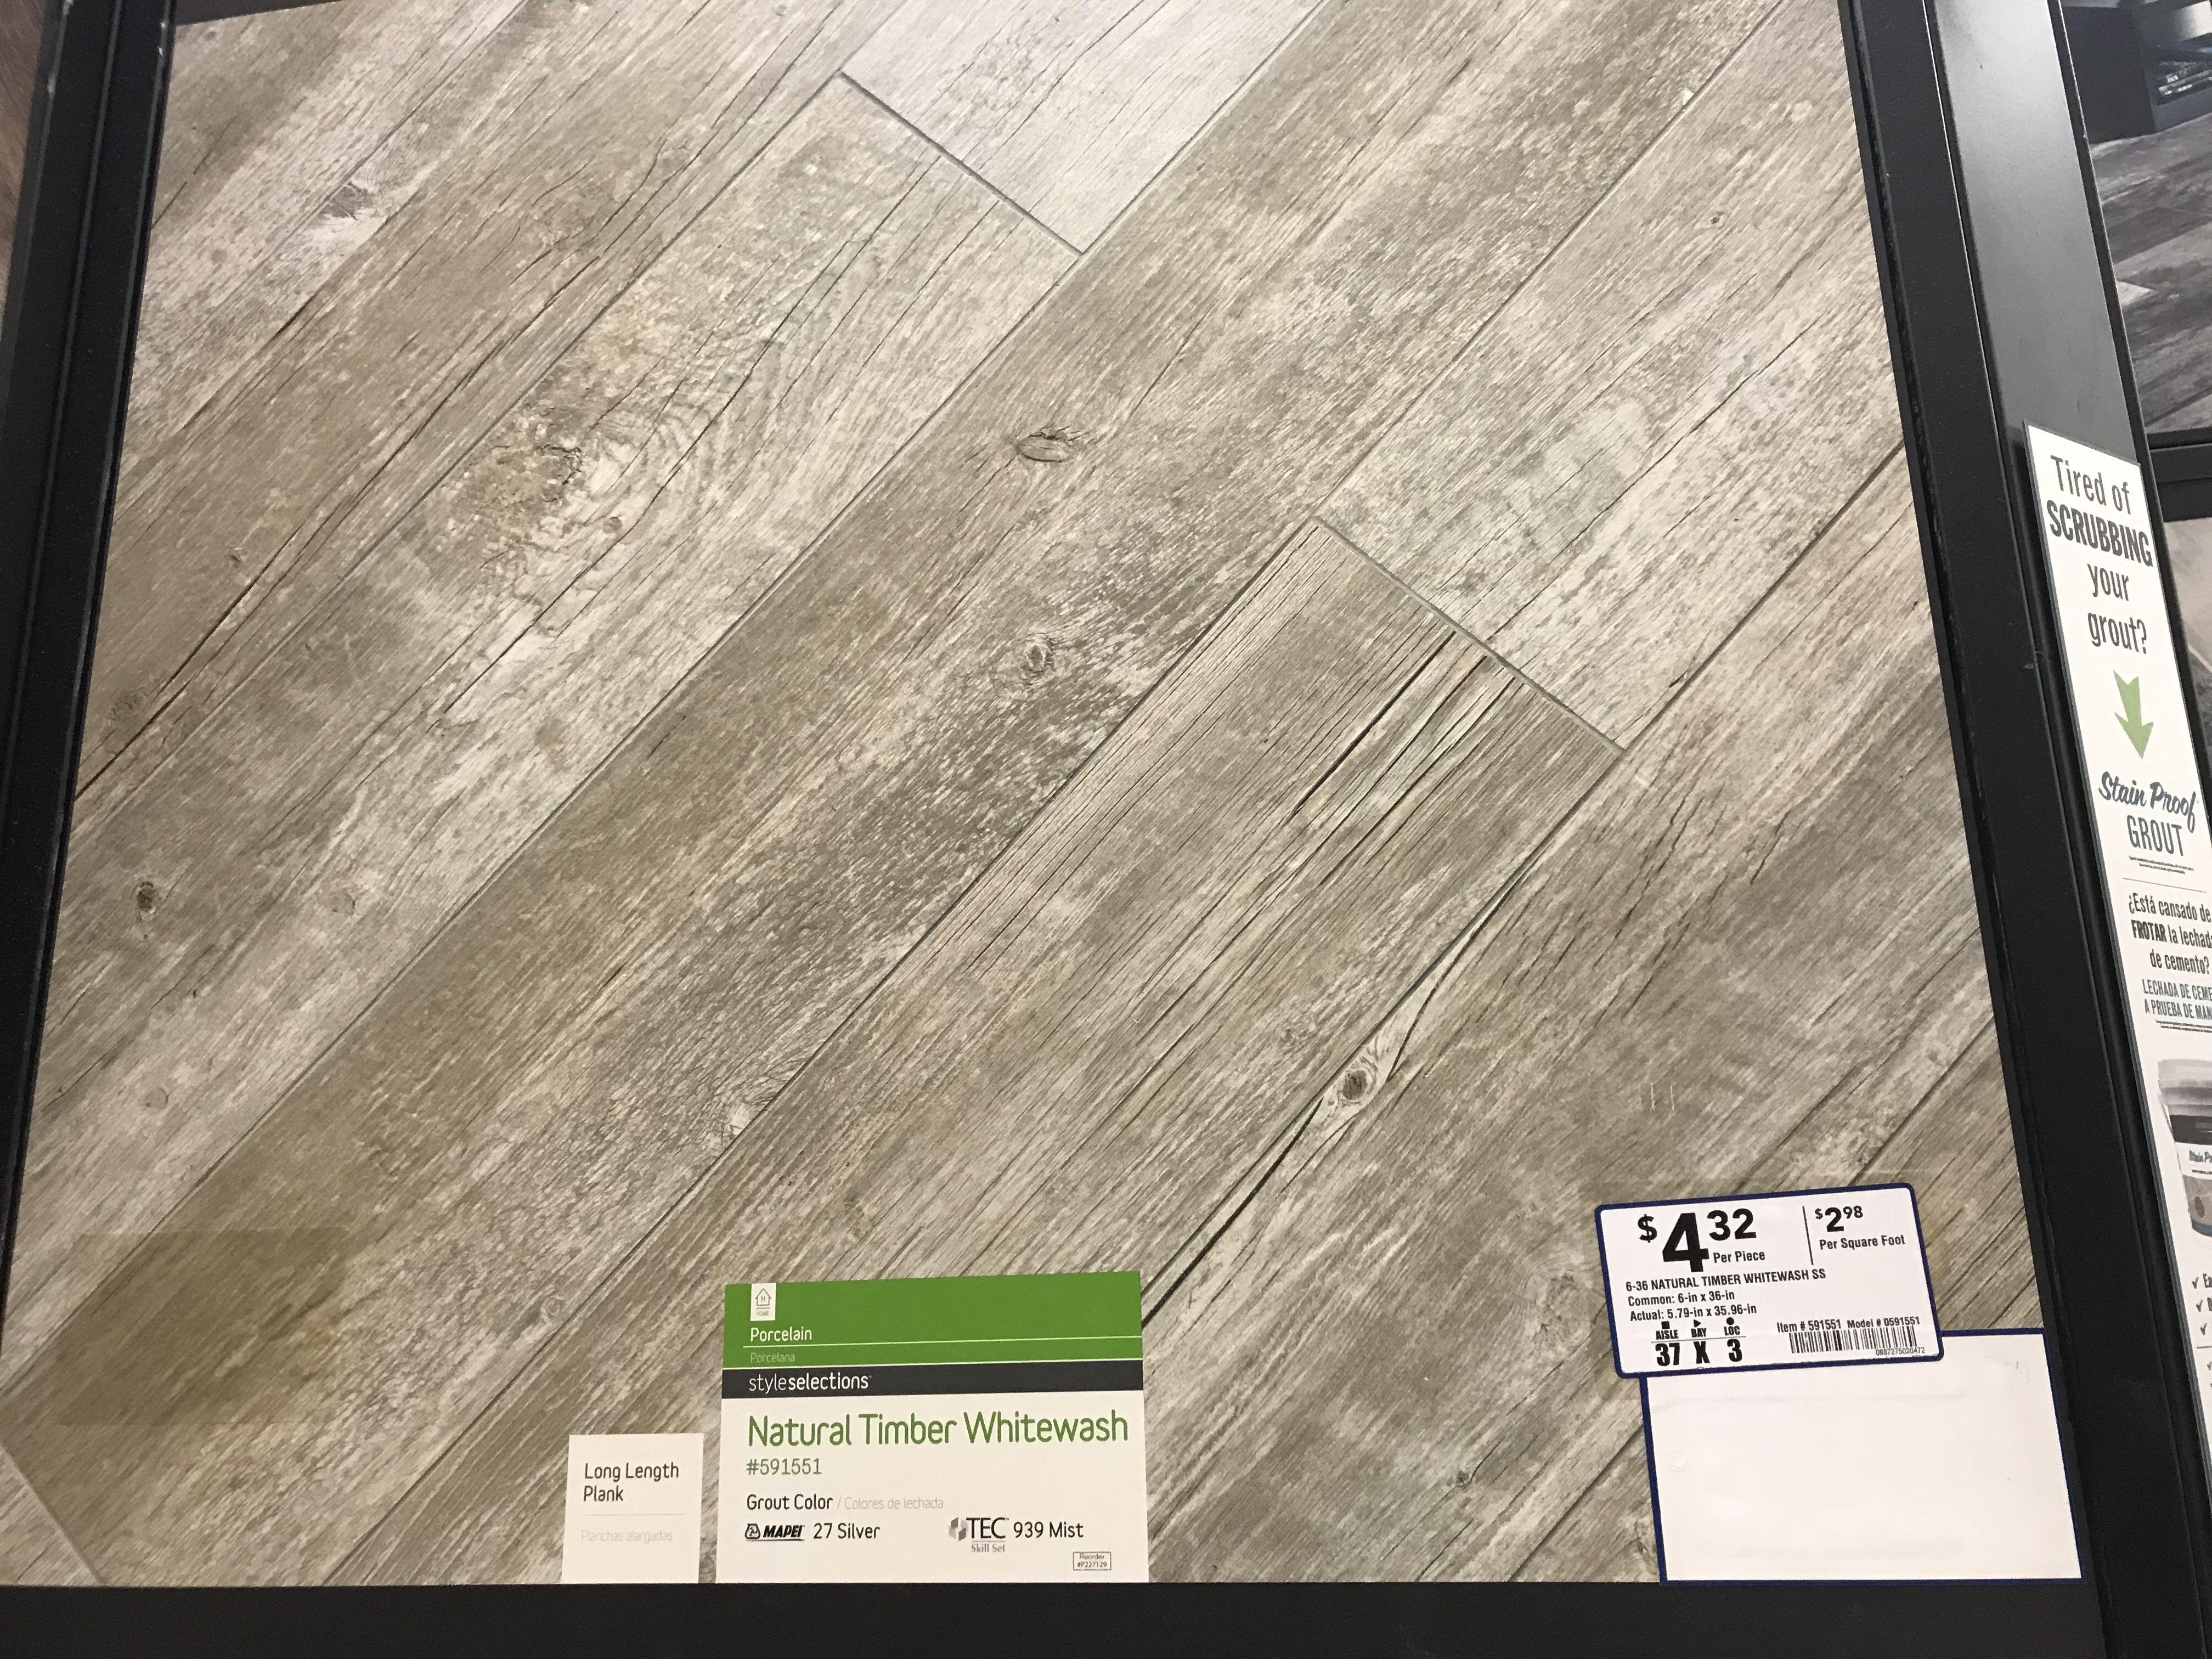 Wood look porcelain tile floor Option 2 Lowes